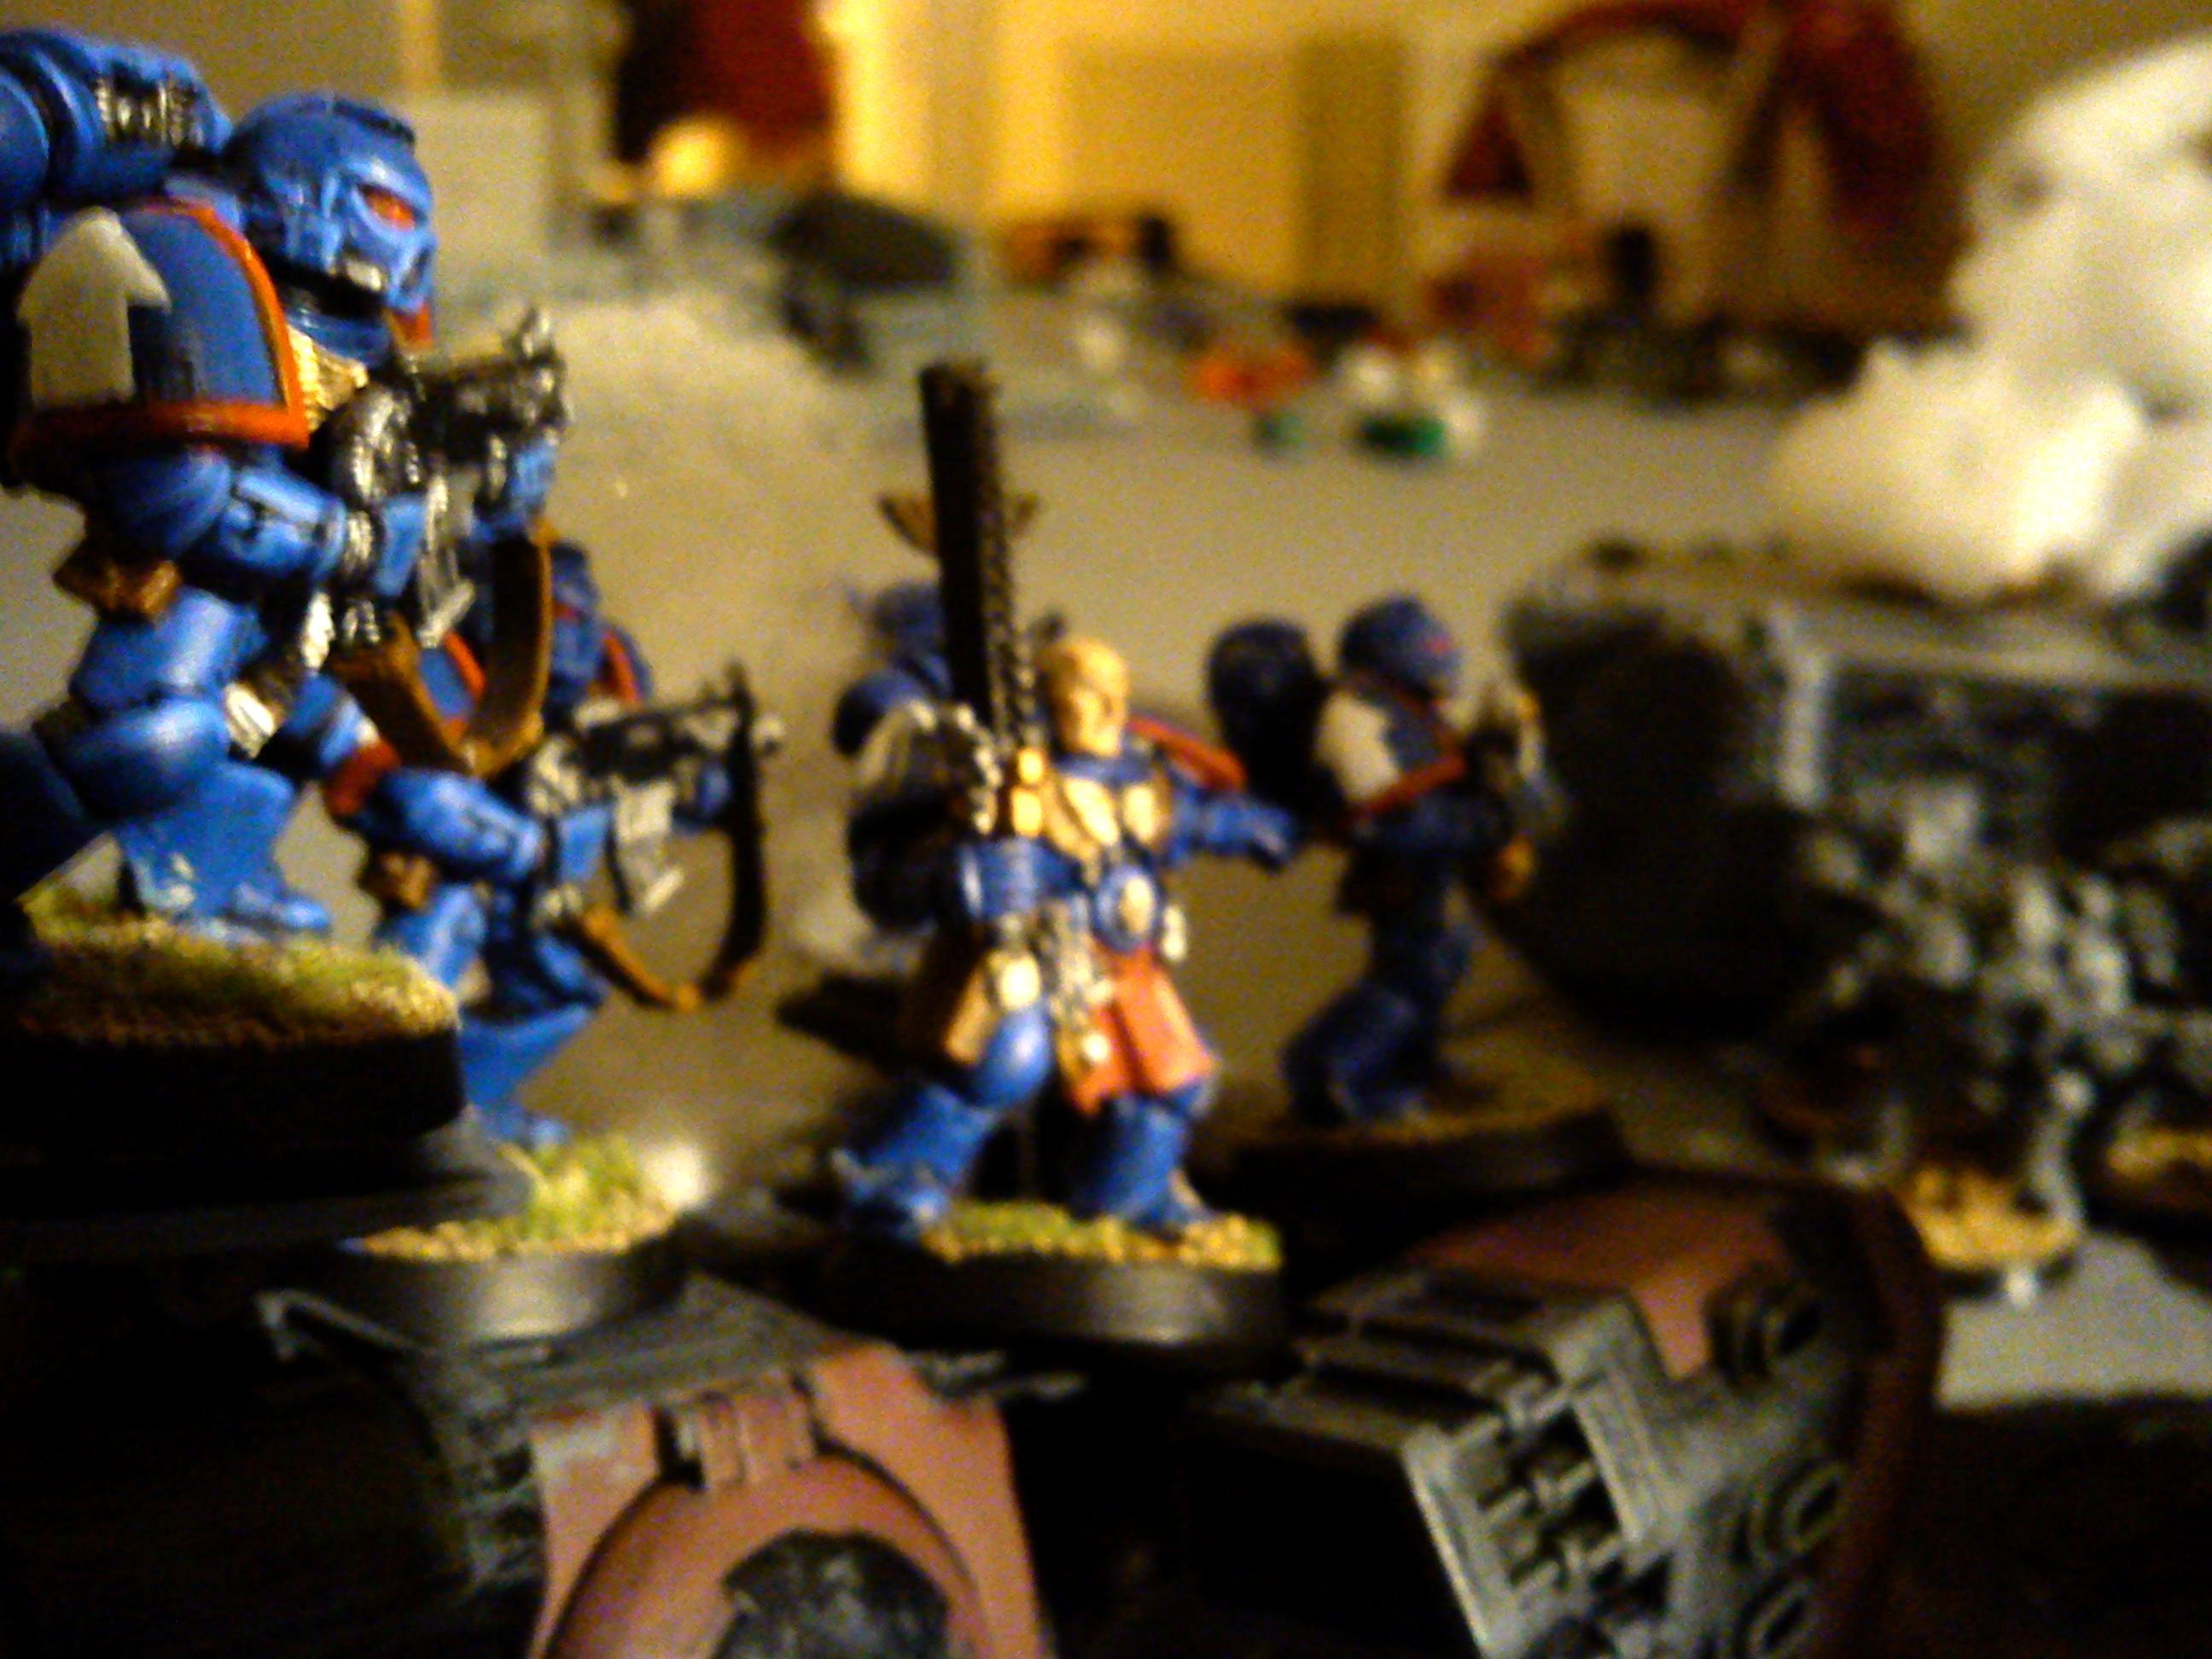 Space Marines, Ultramarines, Warhammer 40,000